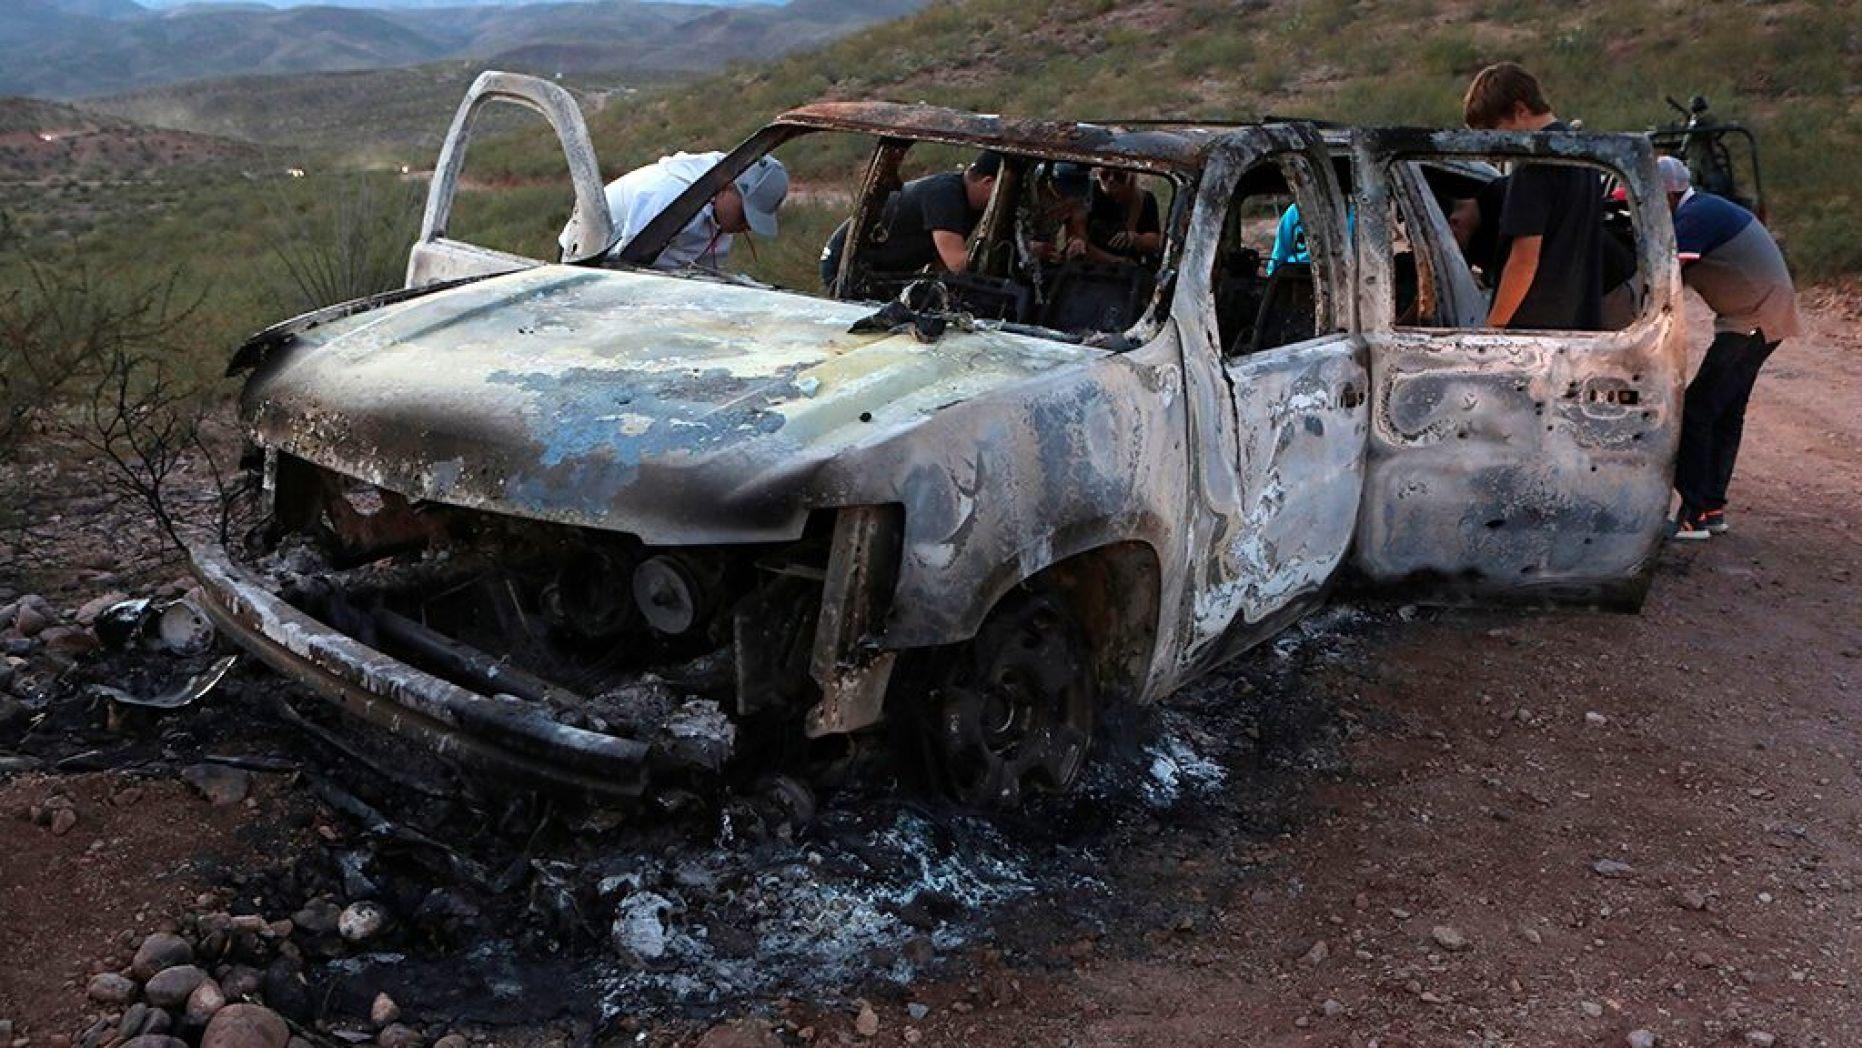 mexico-ambush-5-Reuters.jpg?fit=1862%2C1